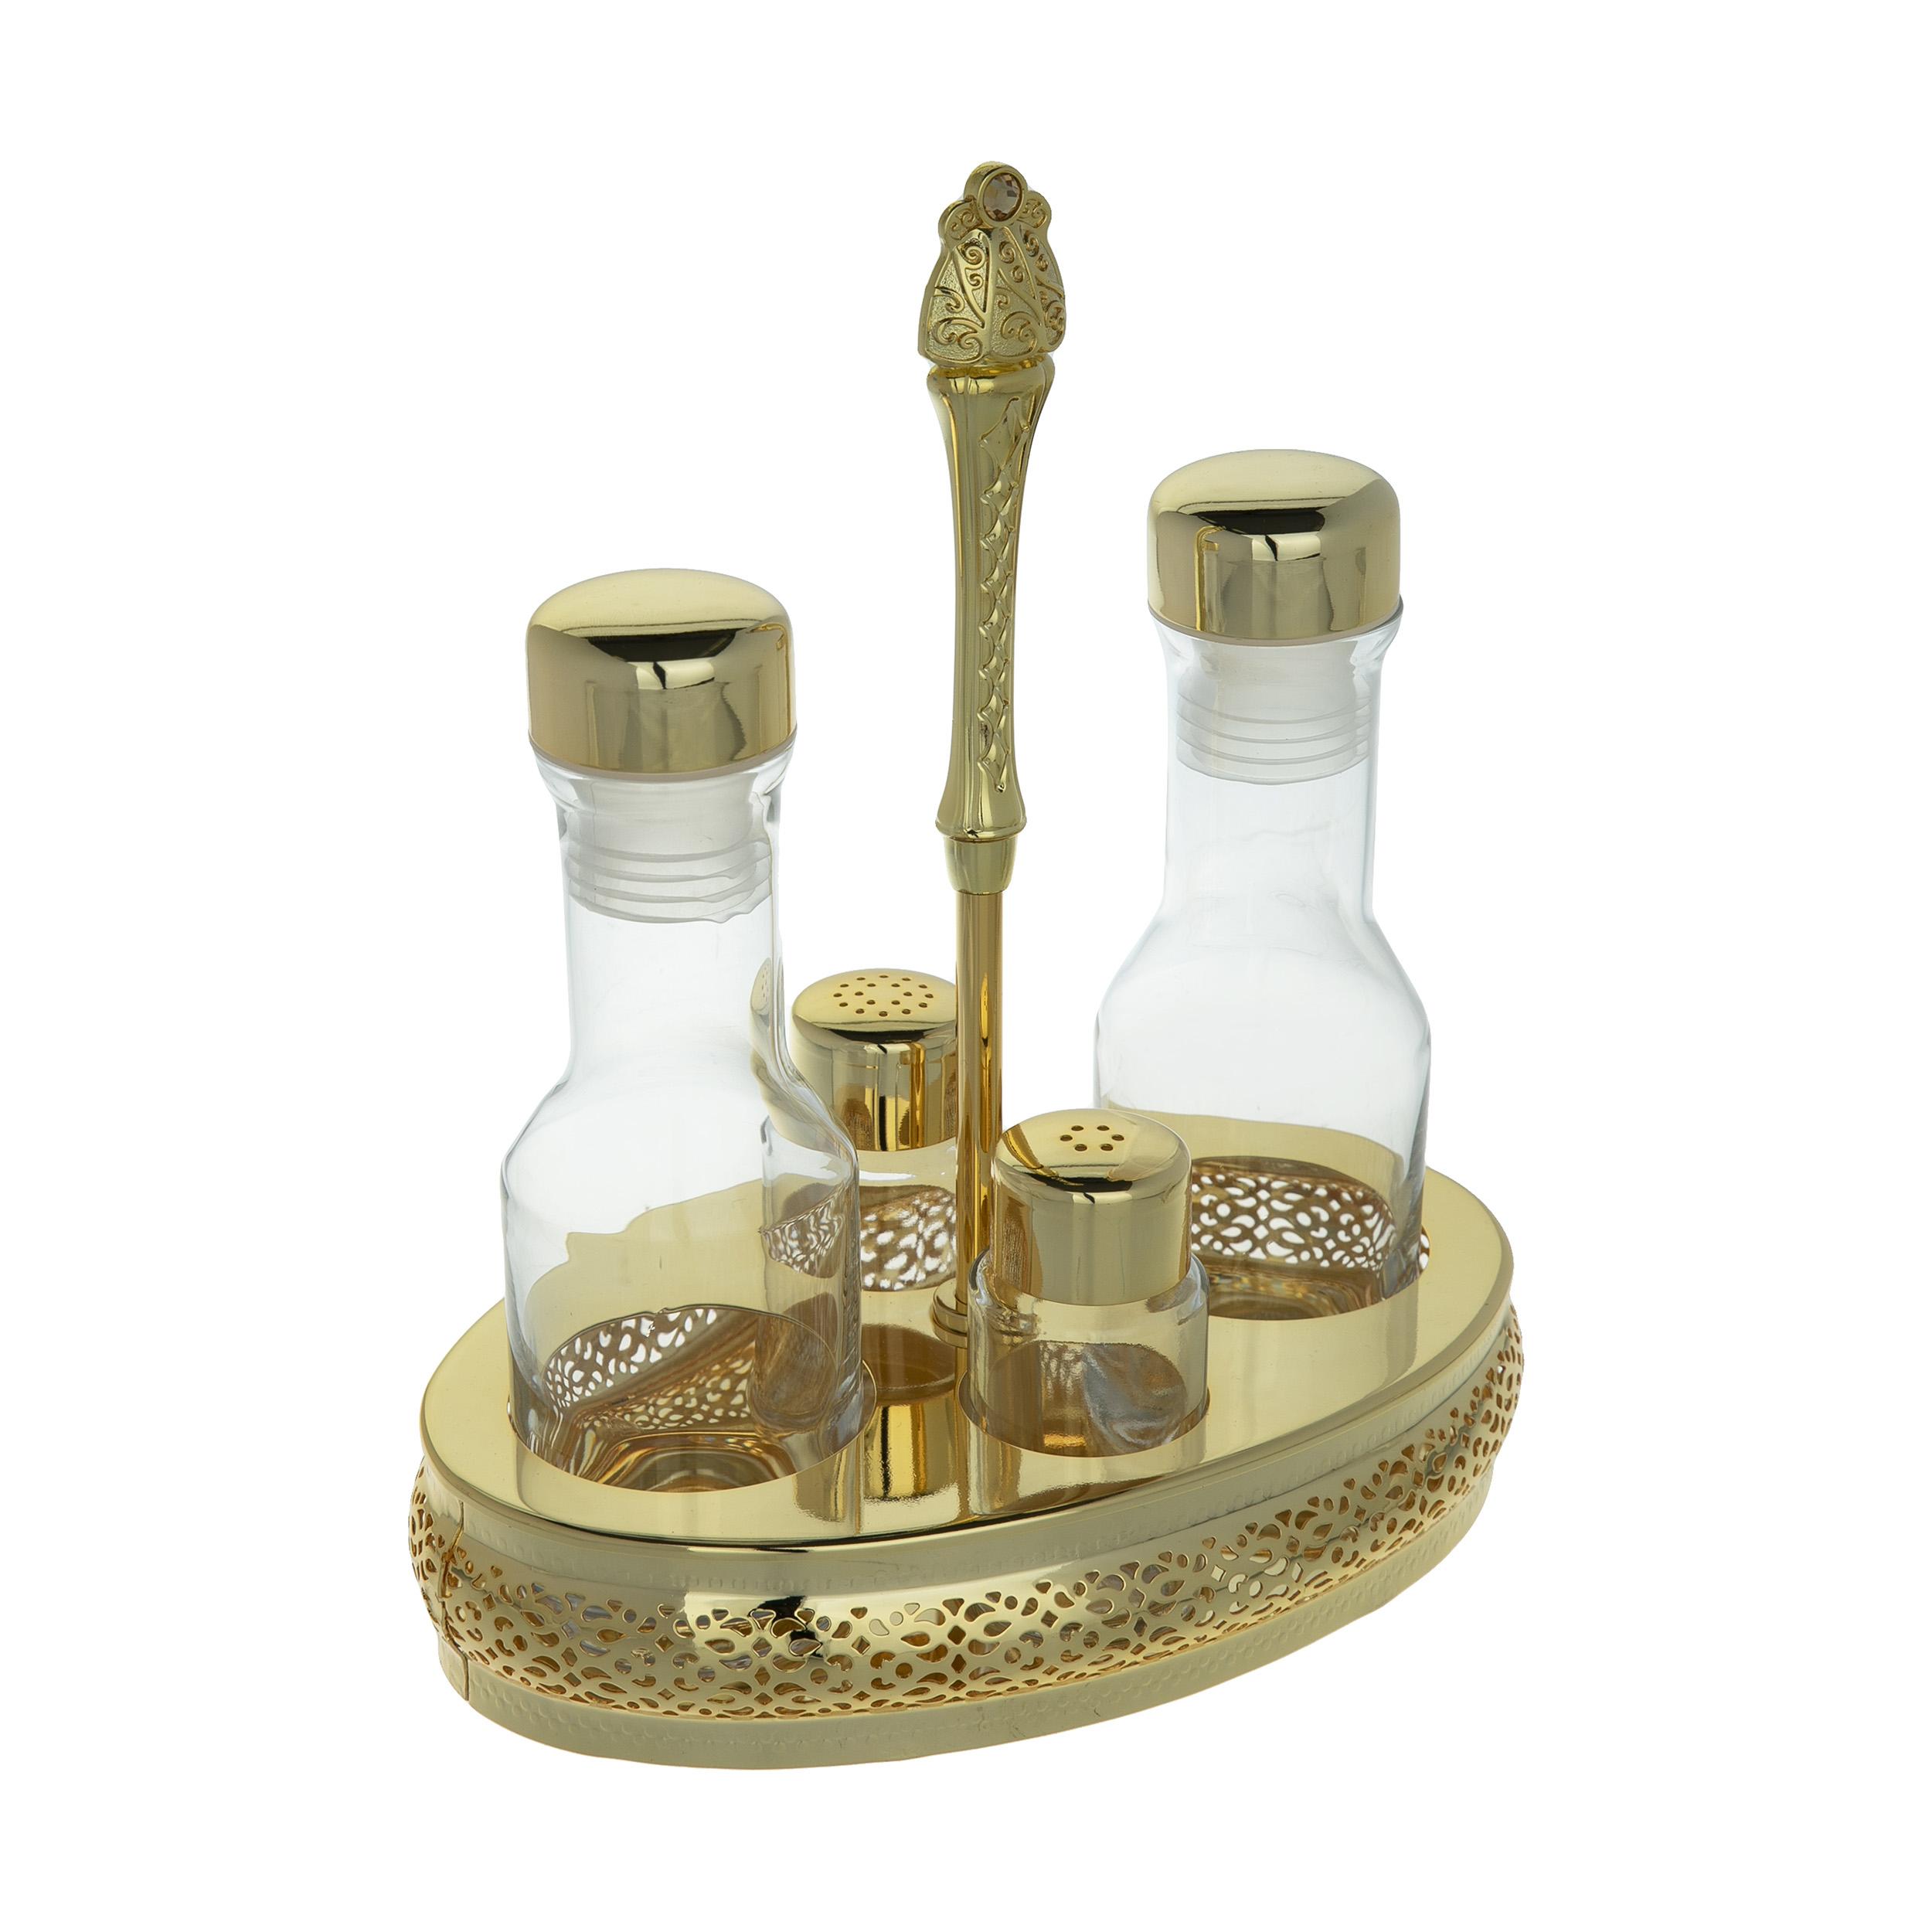 عکس ست آبلیموخوری و نمک پاش 4 پارچه ریجنت مدل ROYAL GOLD کد H2512888